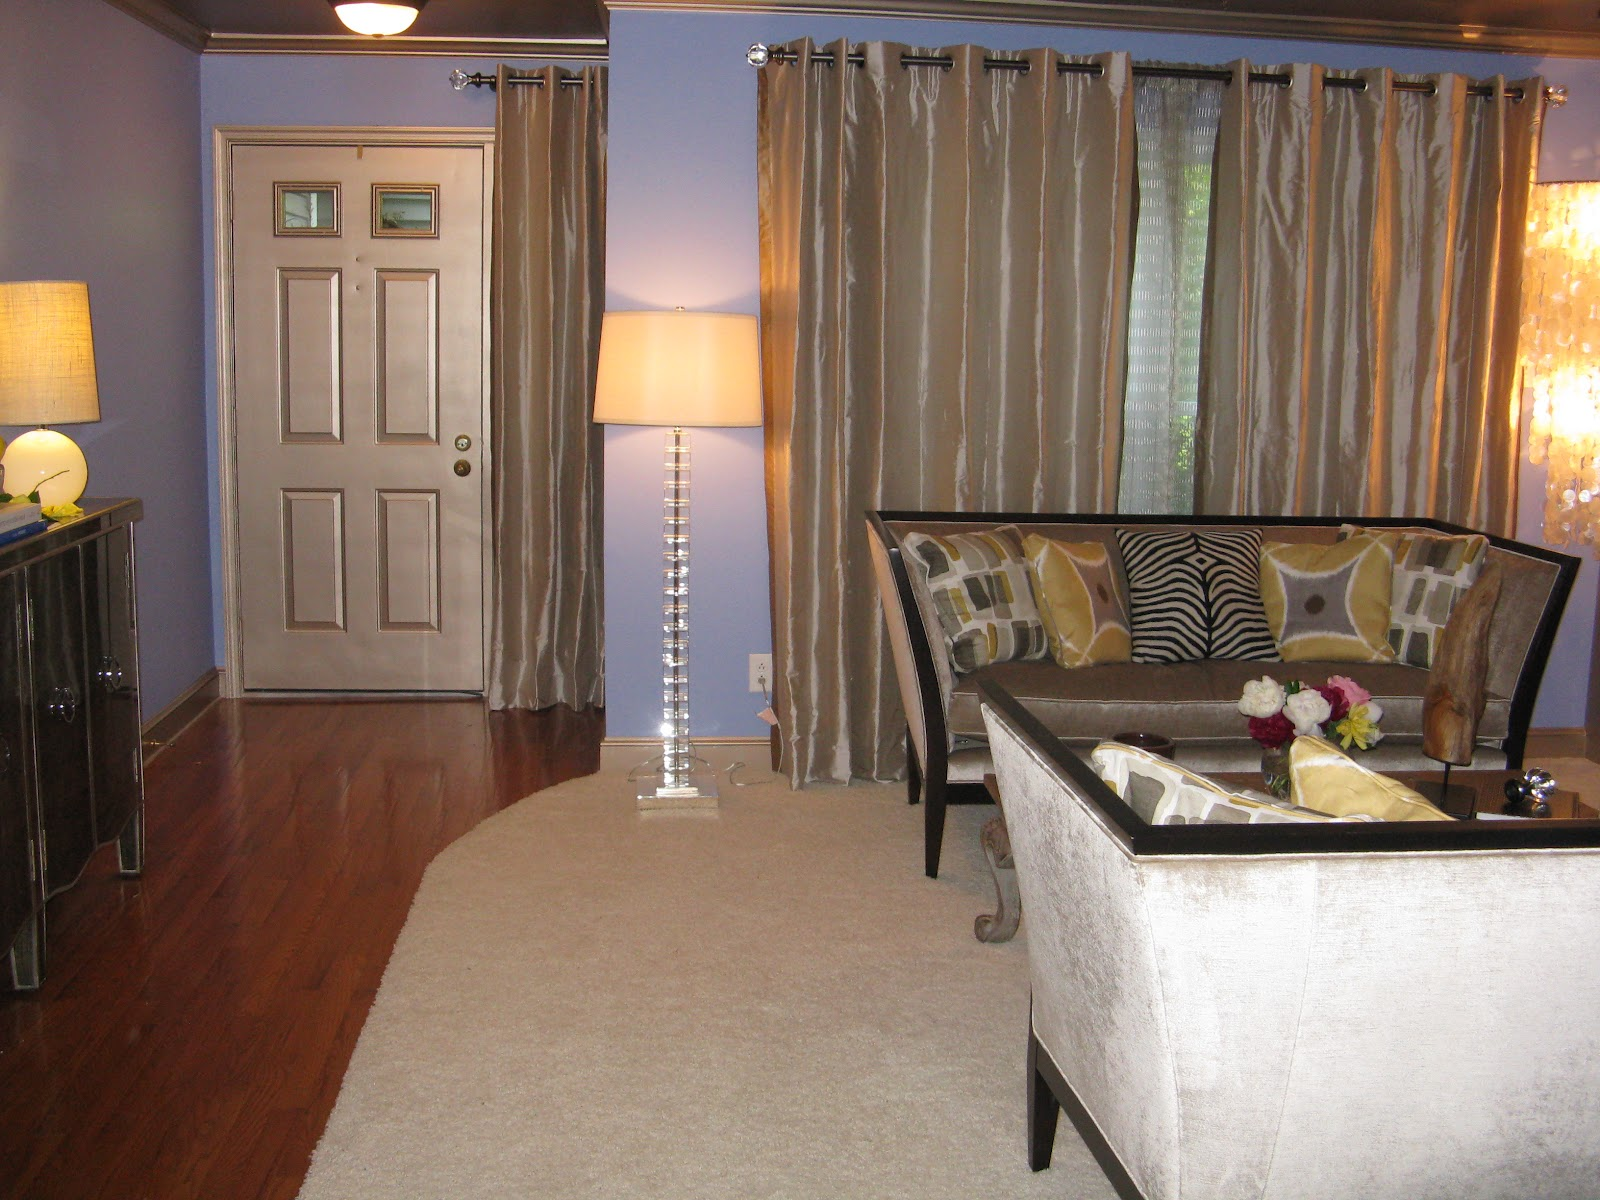 maddiejhomedecor redecorating dining and living room. Black Bedroom Furniture Sets. Home Design Ideas